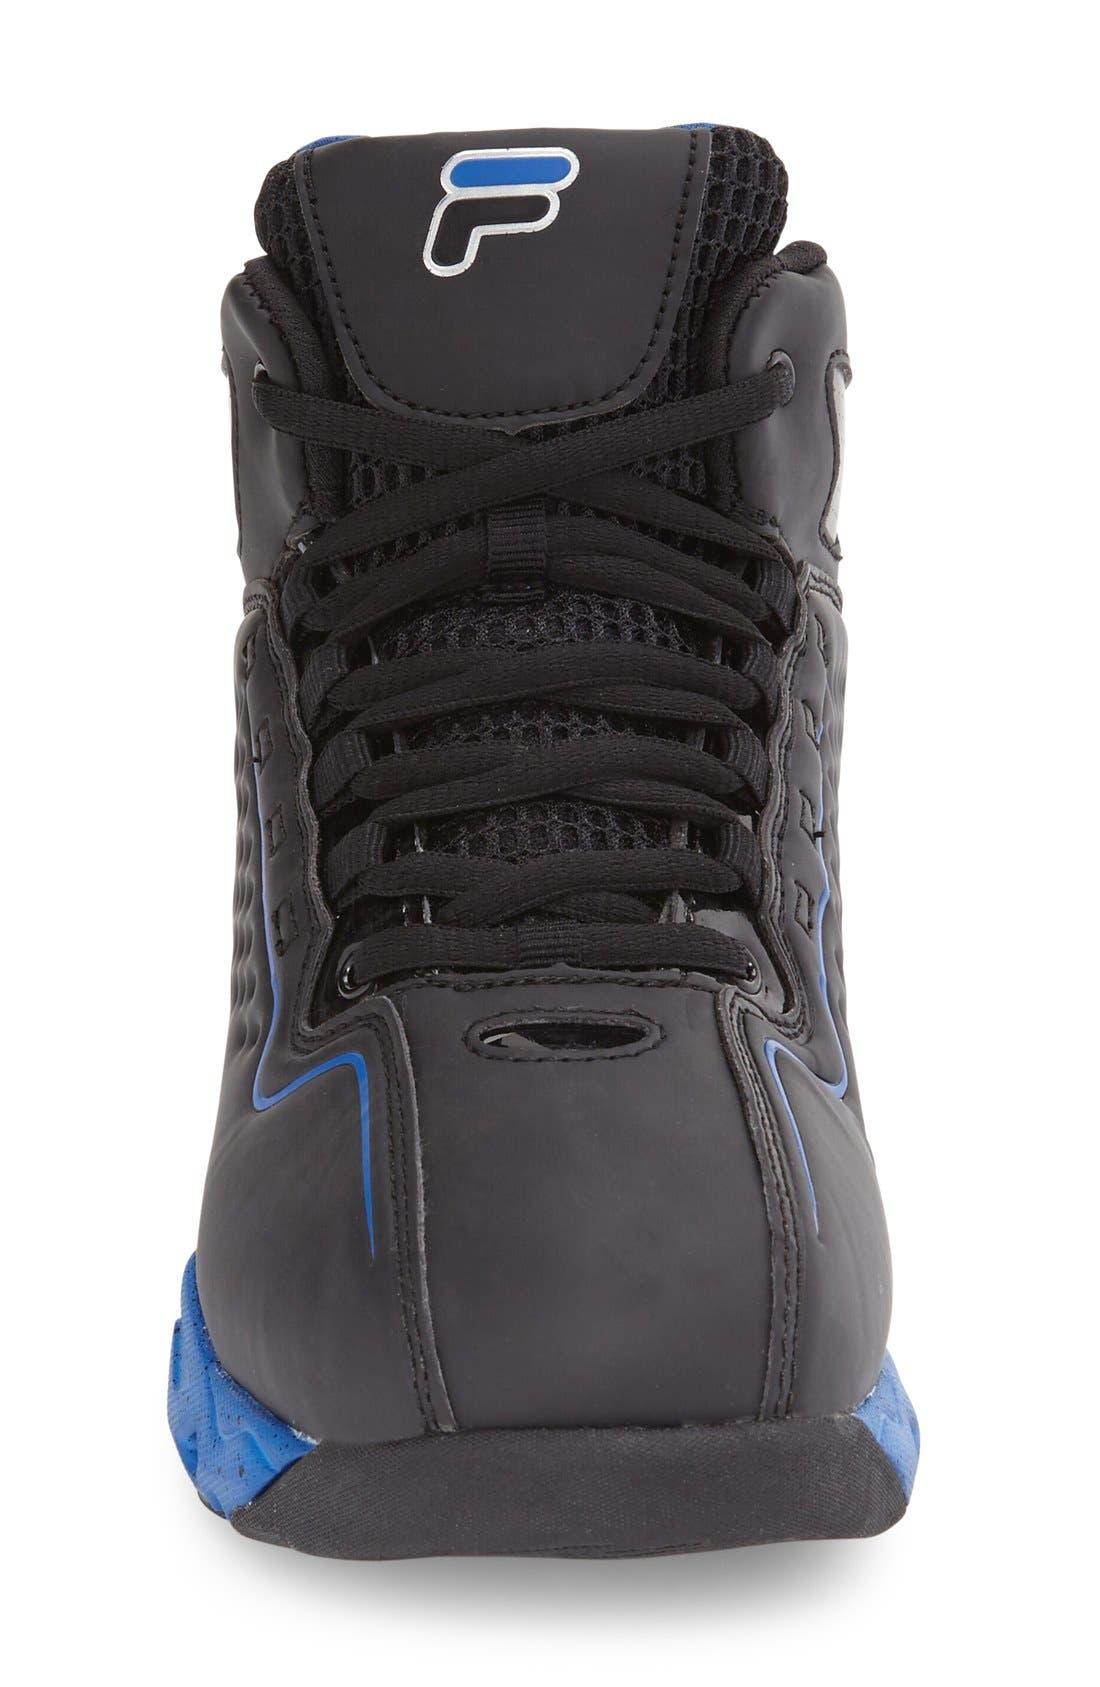 FILA,                             Big Bang High Top Sneaker,                             Alternate thumbnail 3, color,                             001